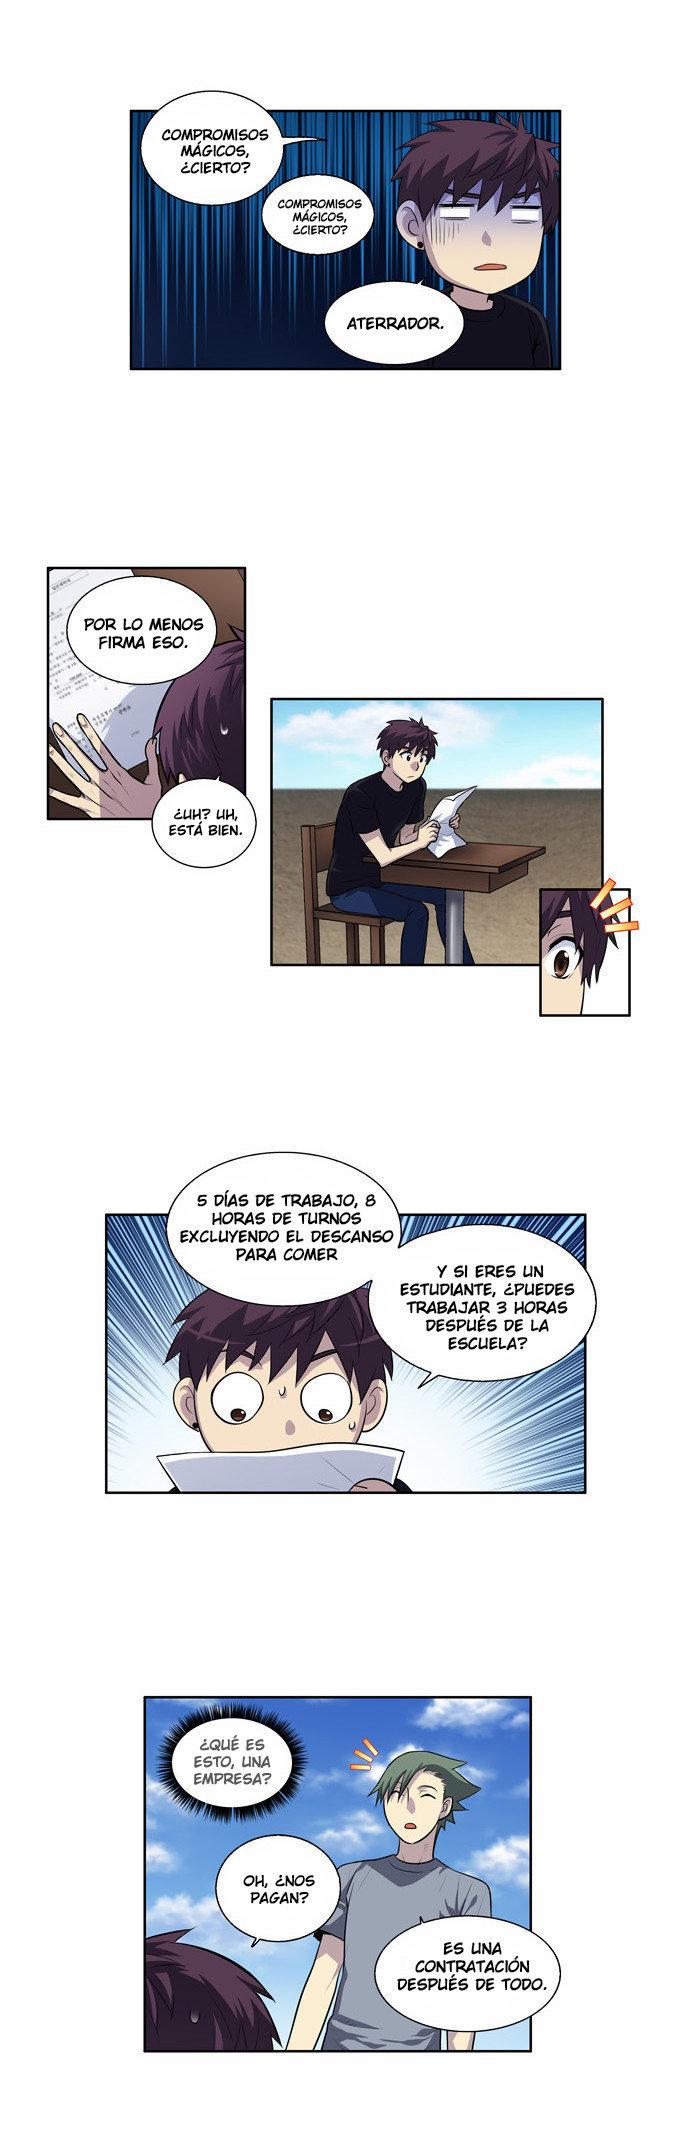 http://c5.ninemanga.com/es_manga/61/1725/446811/47e57c4836ae0c44f774f9d8497e0b4f.jpg Page 4